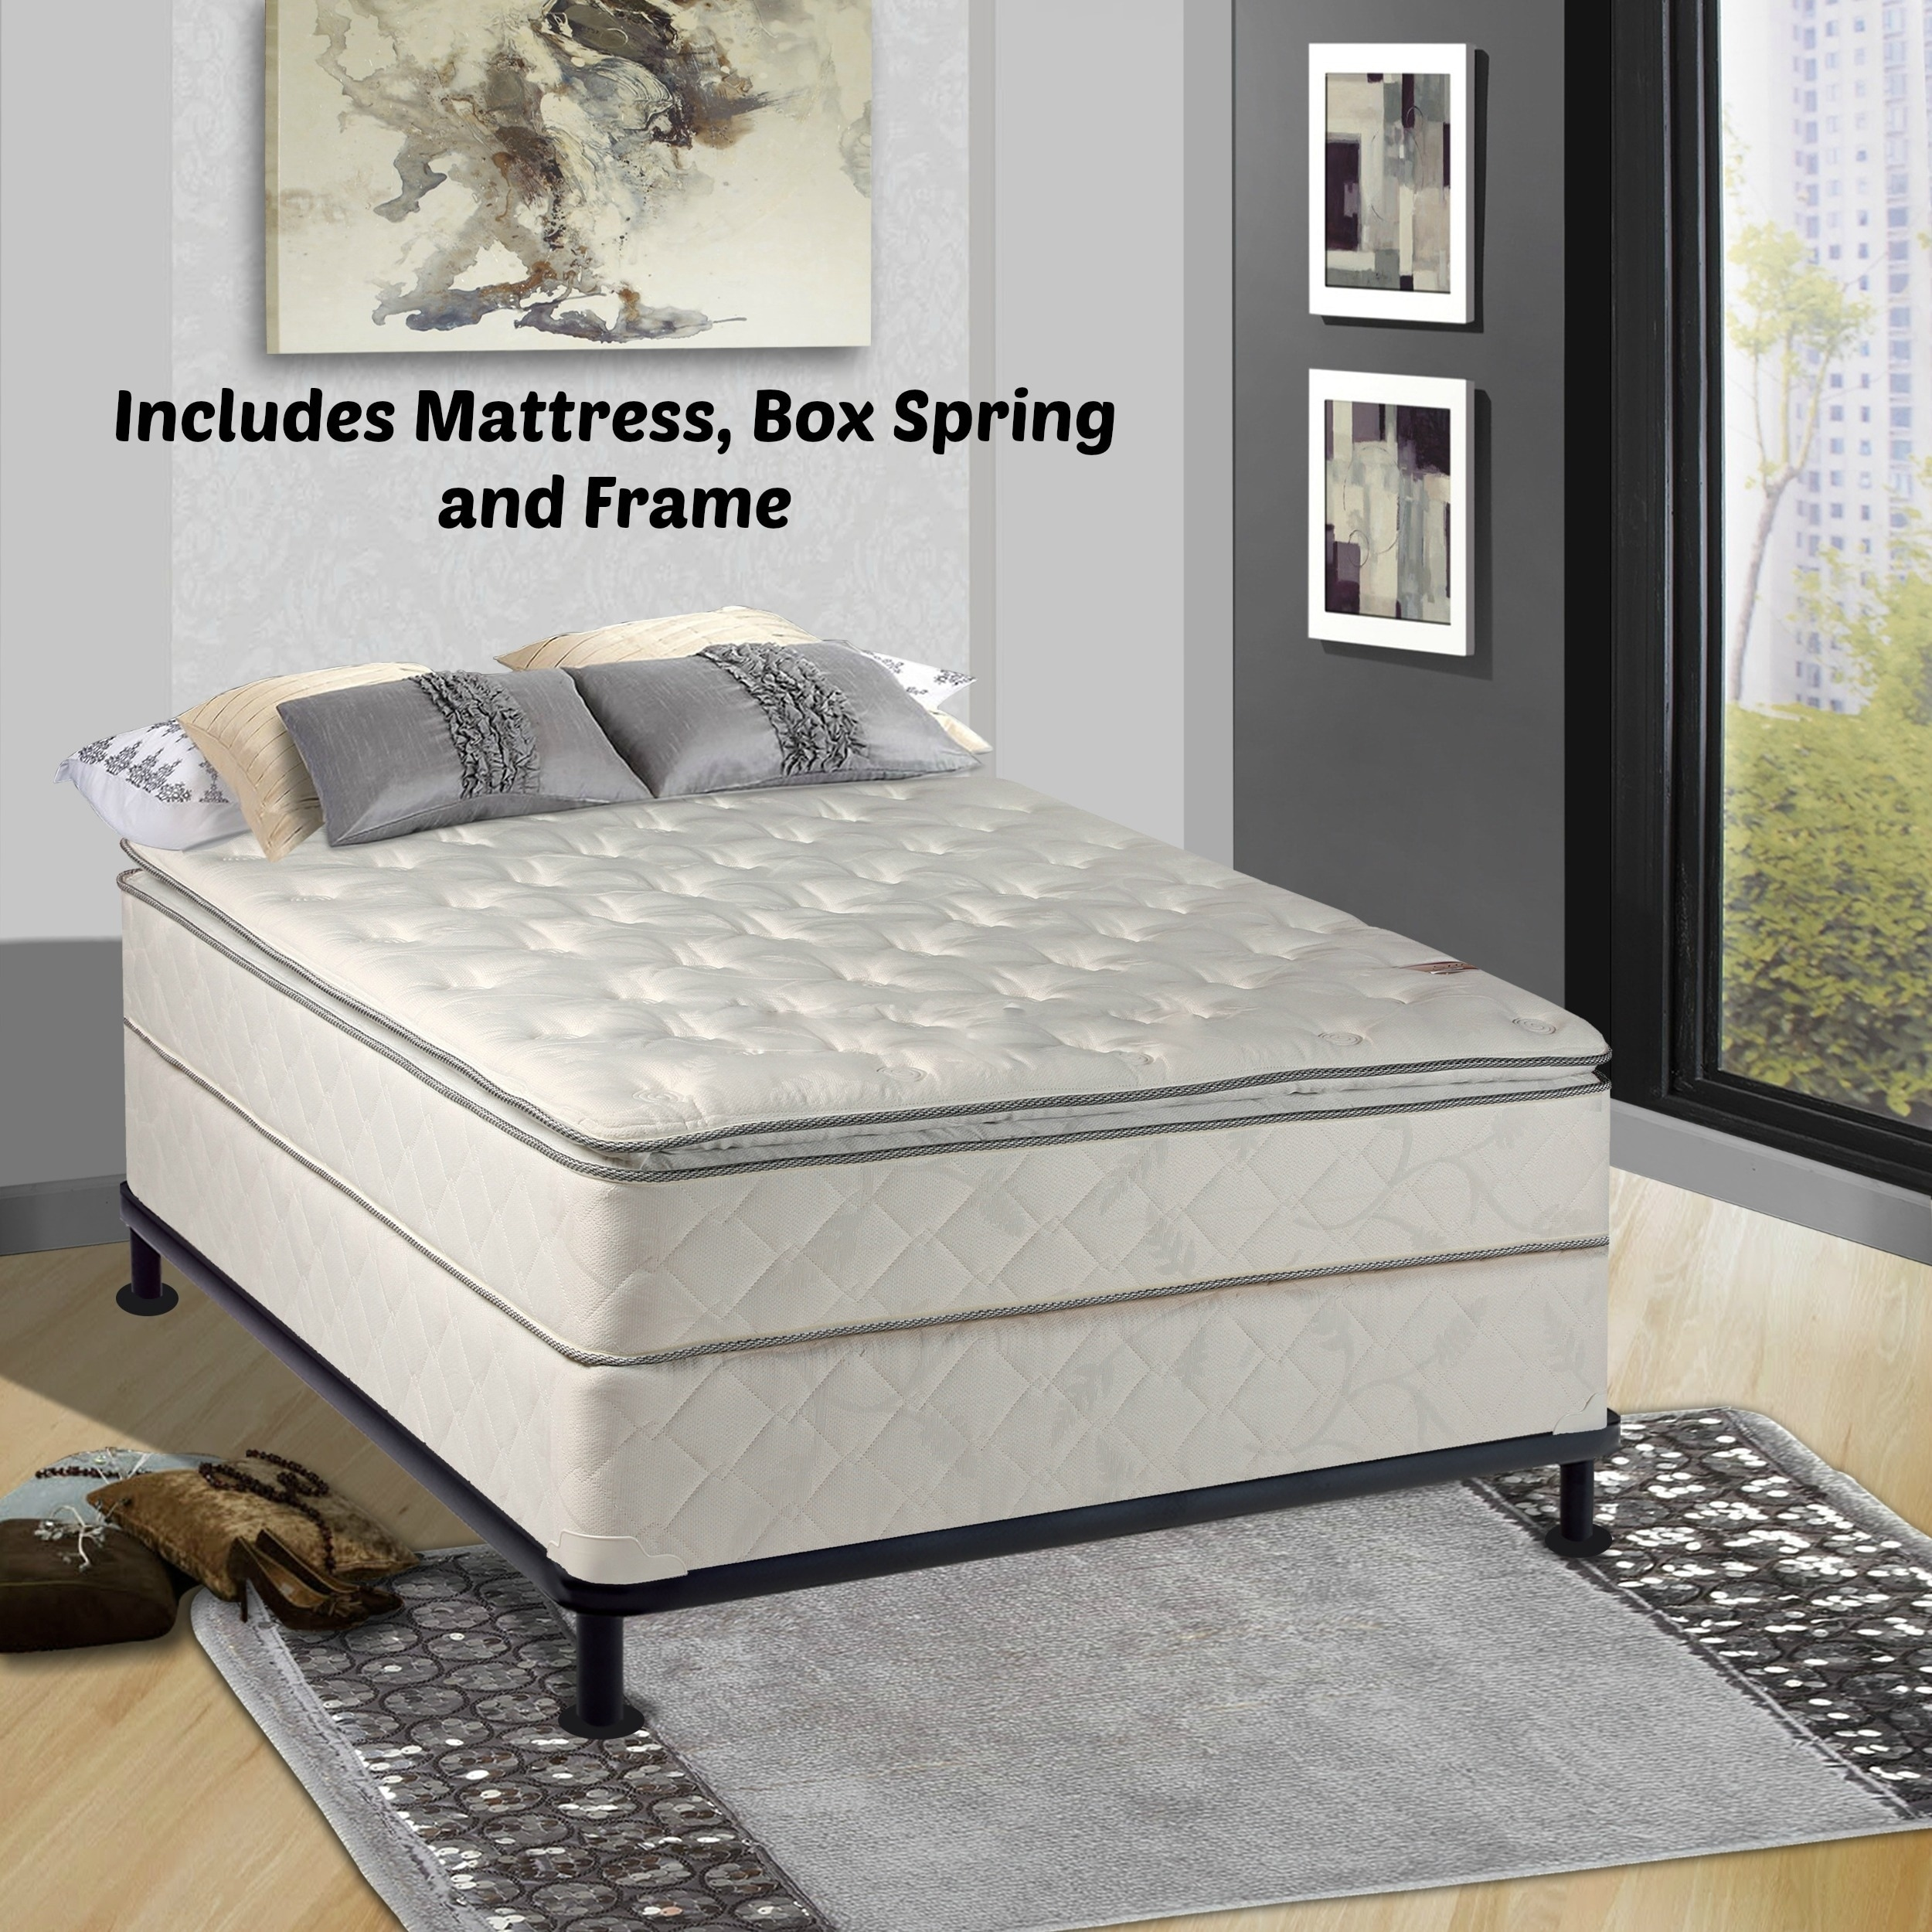 venice orthopedic cover vegas twin pillow serta beautiful top ser of las set mattress firm